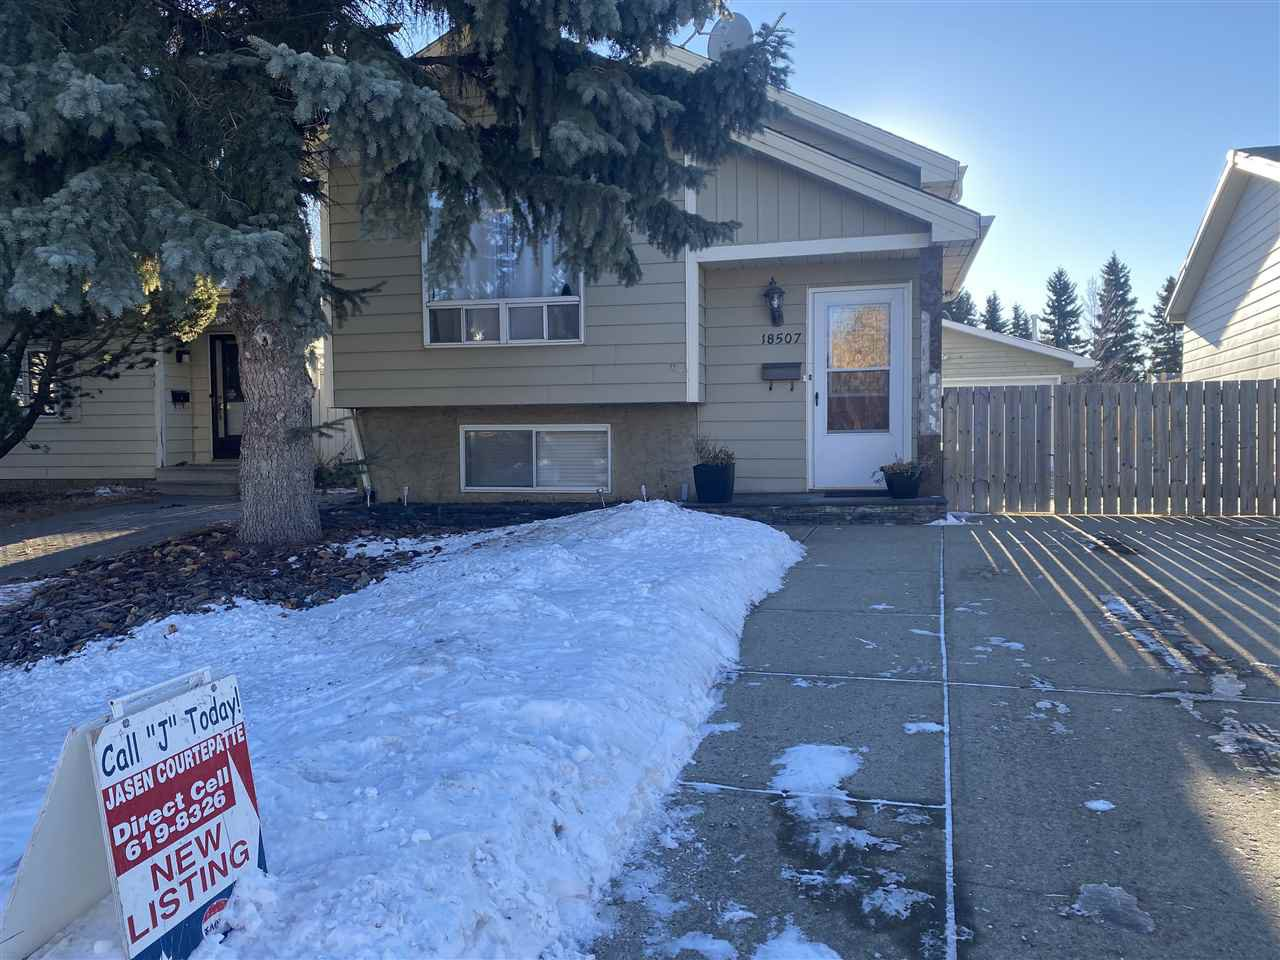 Main Photo: 18507 95A Avenue in Edmonton: Zone 20 House for sale : MLS®# E4225118